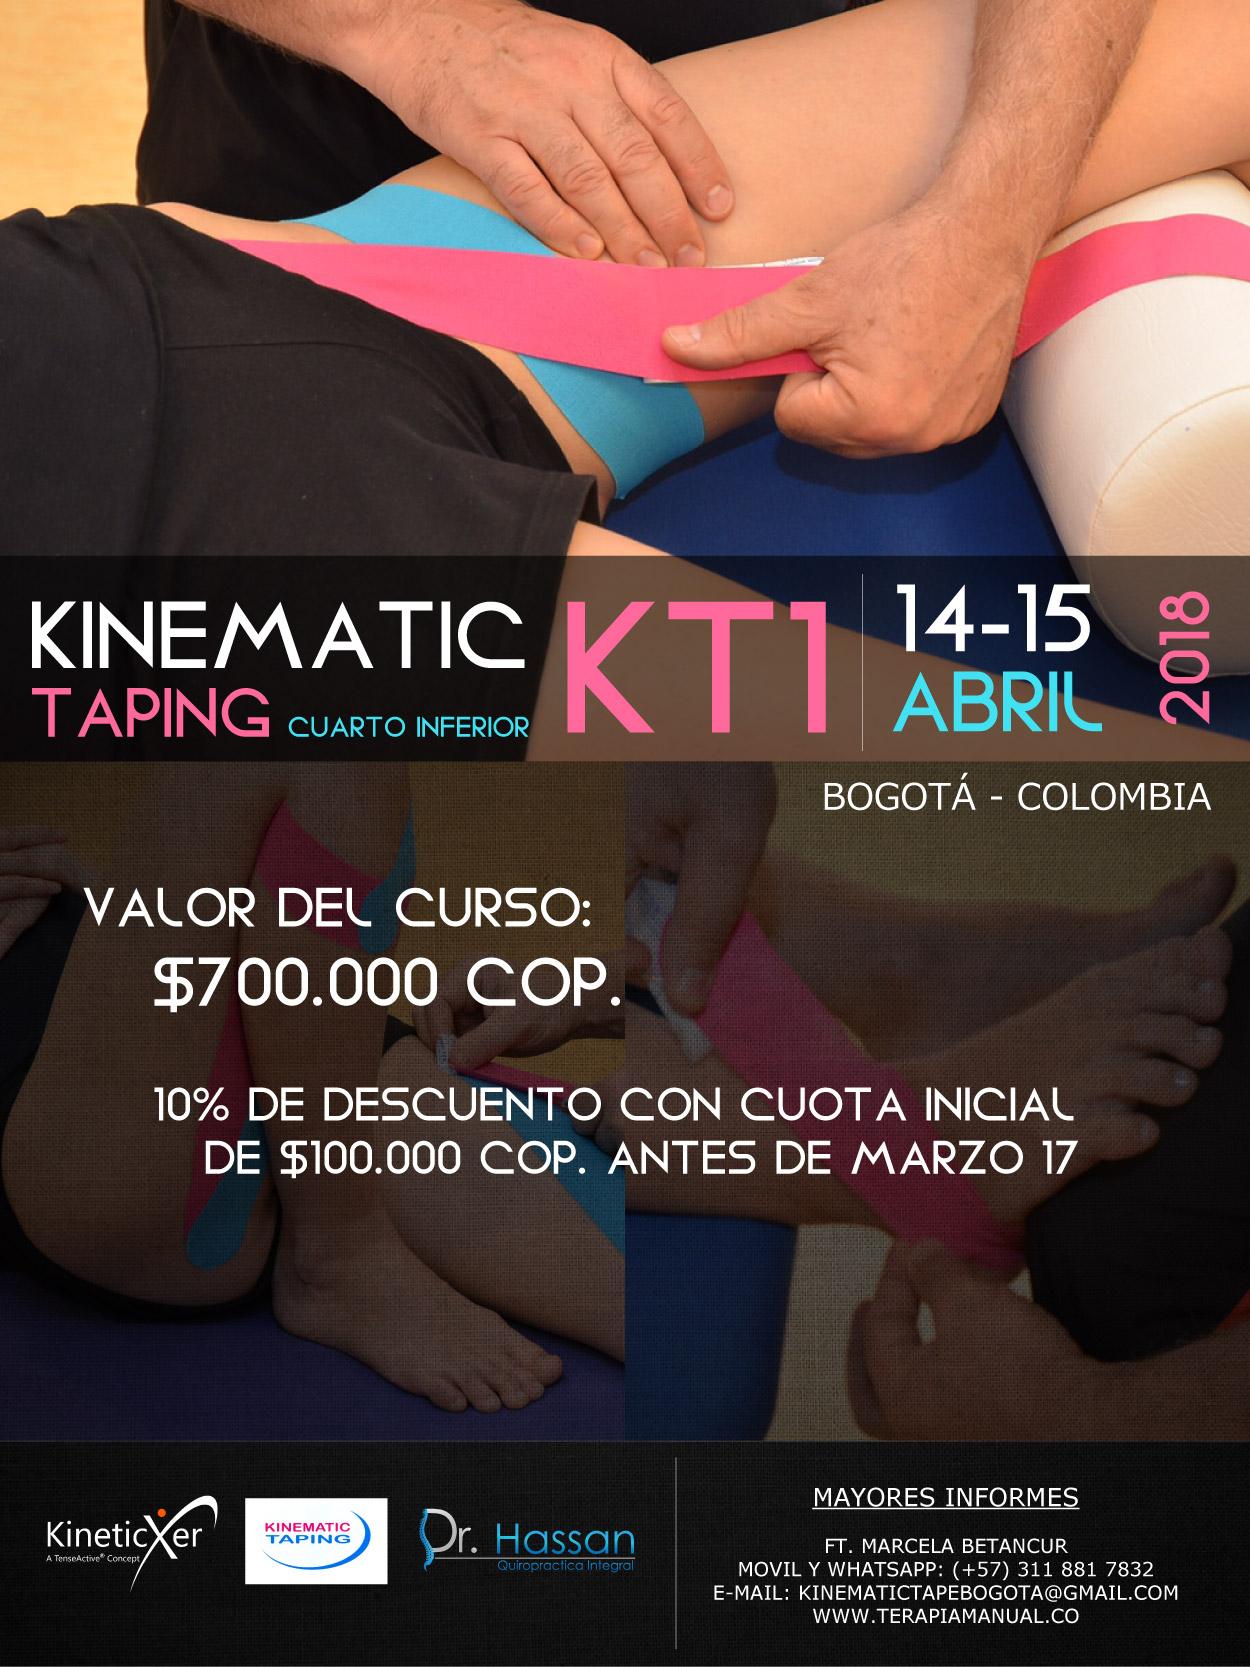 Kinematic Taping Kt1 - Bogotá Marzo 2018-013